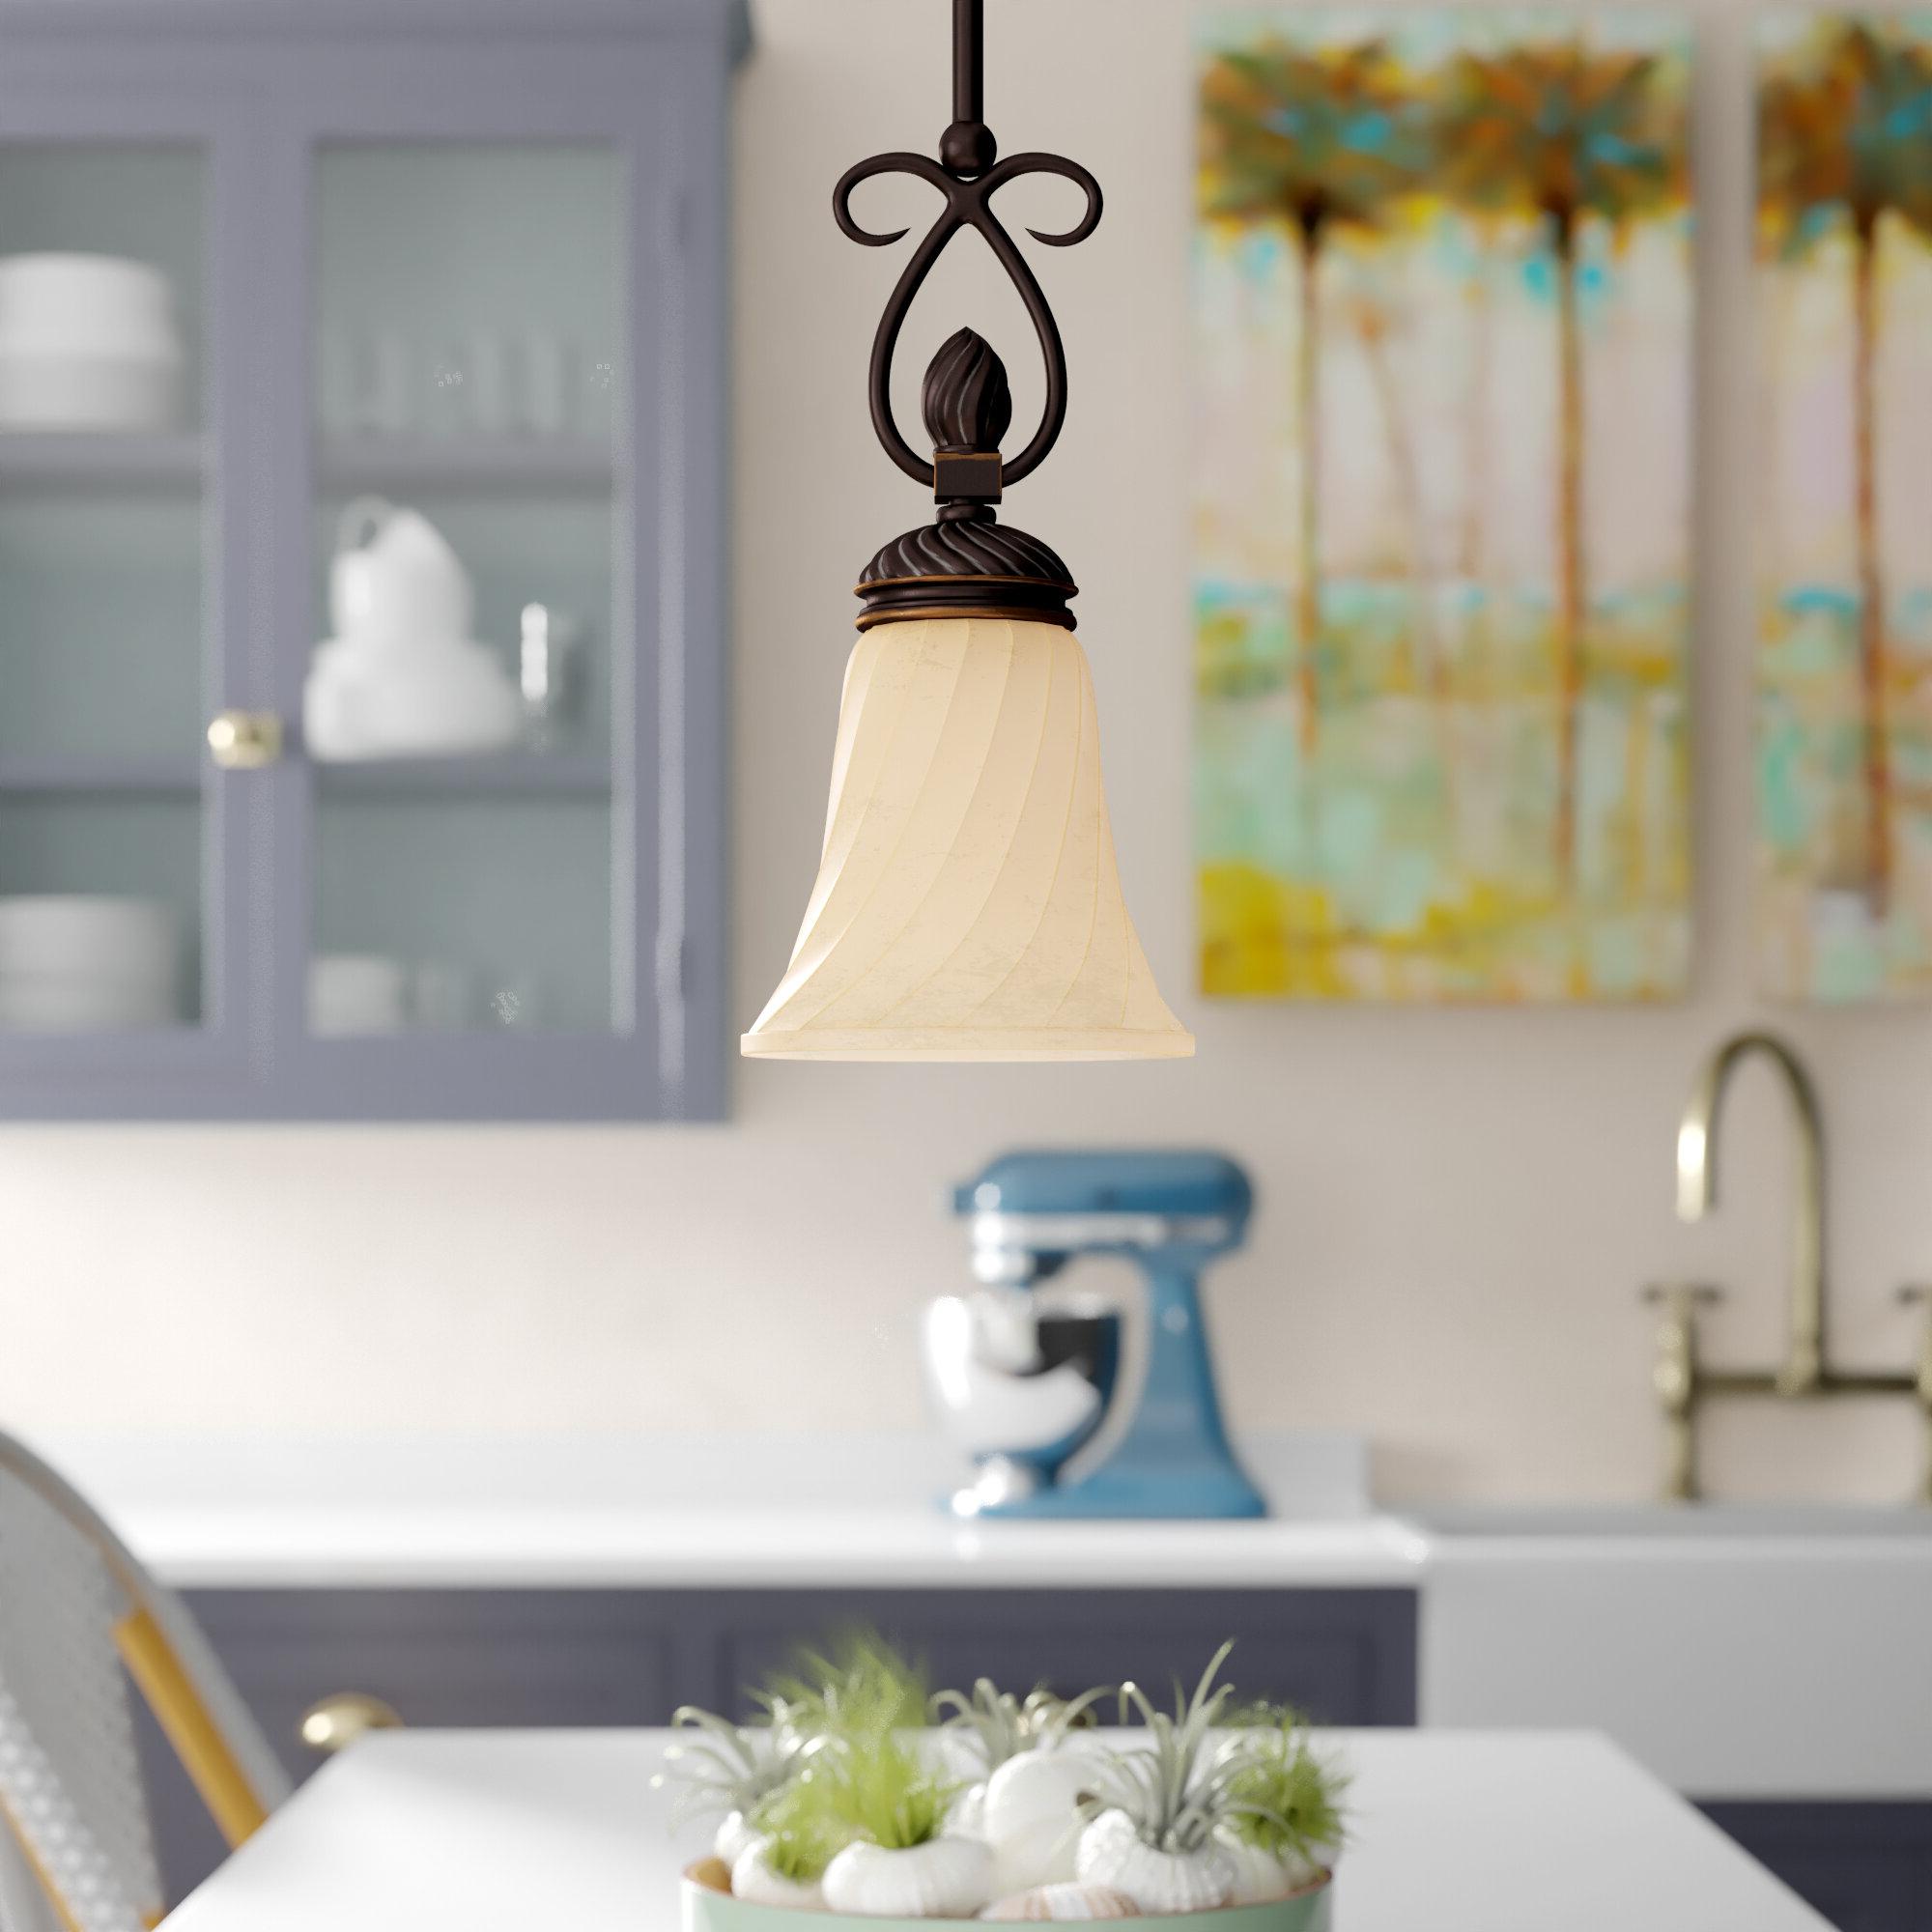 Grullon Scroll 1 Light Single Bell Pendants Intended For Popular Hoopeston 1 Light Single Bell Pendant (View 15 of 25)